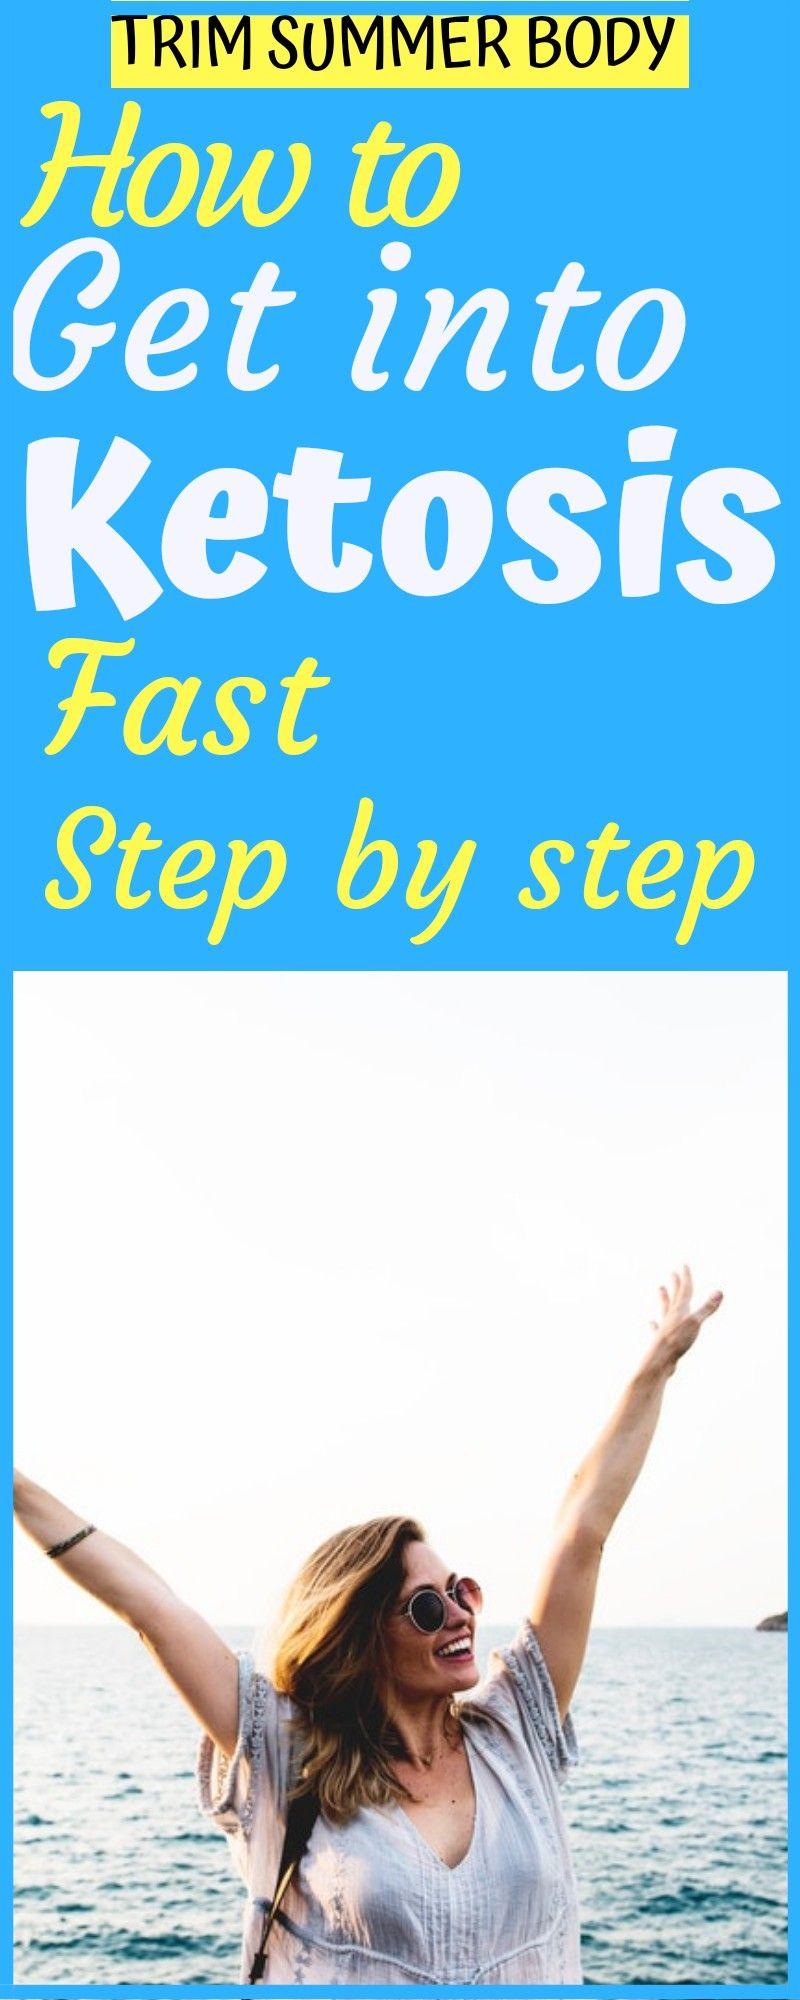 how to get into ketosis, how to get into ketosis fast